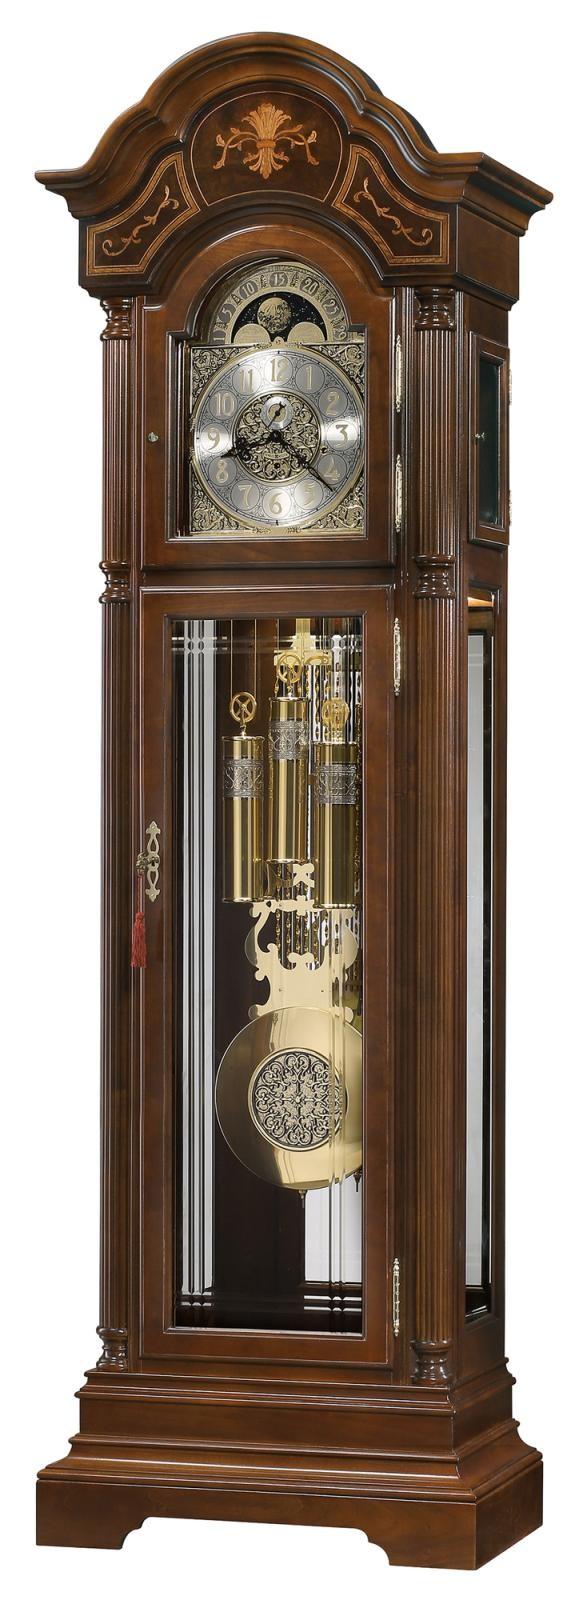 Howard Miller Grandfather Clock Won T Chime Clockway Howard Miller Harding Deluxe Chiming